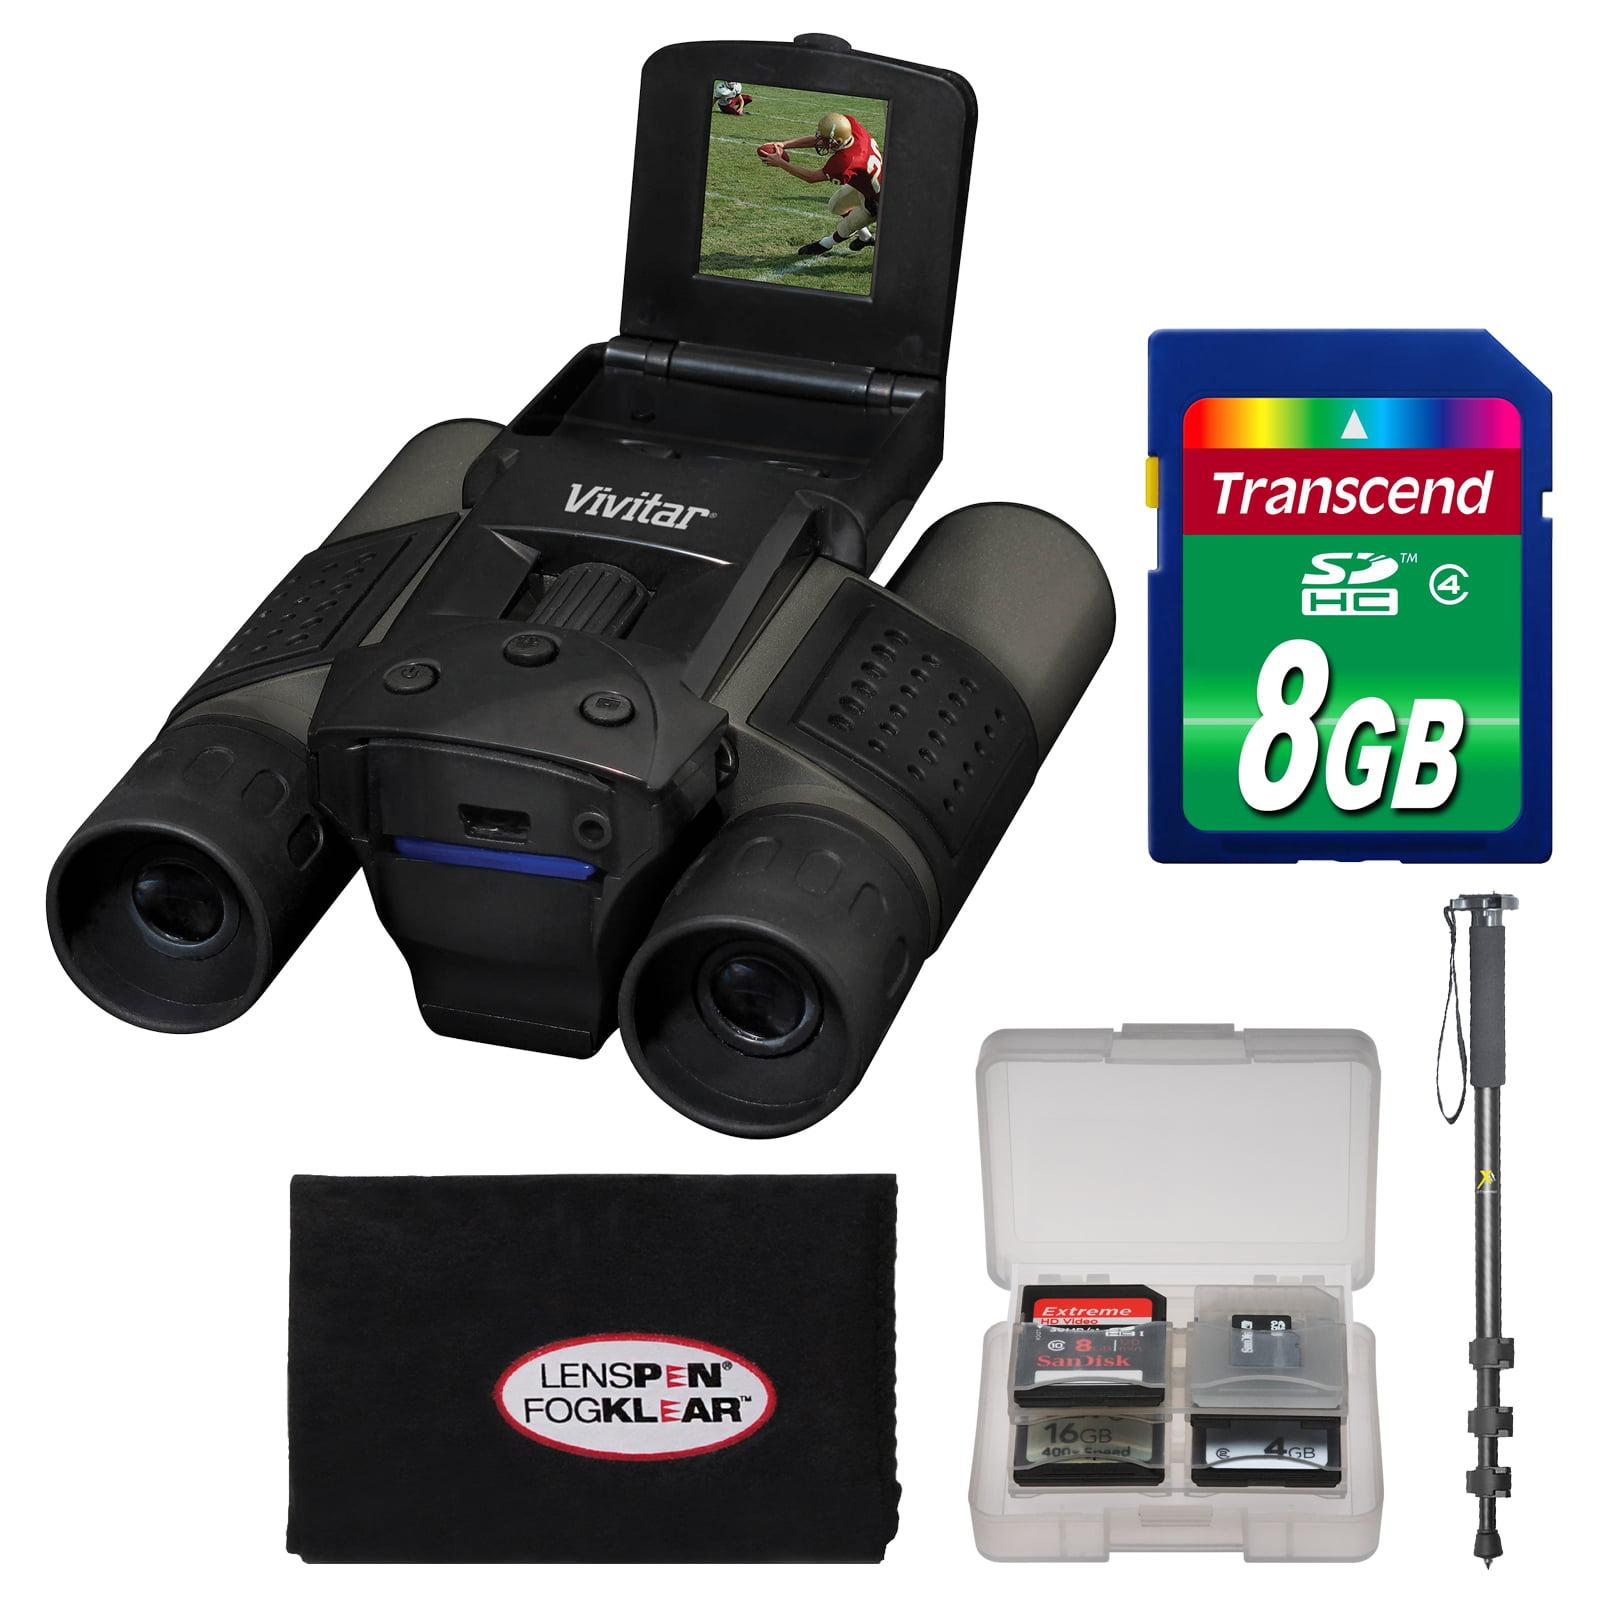 Vivitar 12x25 Binoculars with Built-in Digital Camera with 8GB Card + Monopod + Accessory Kit by Vivitar